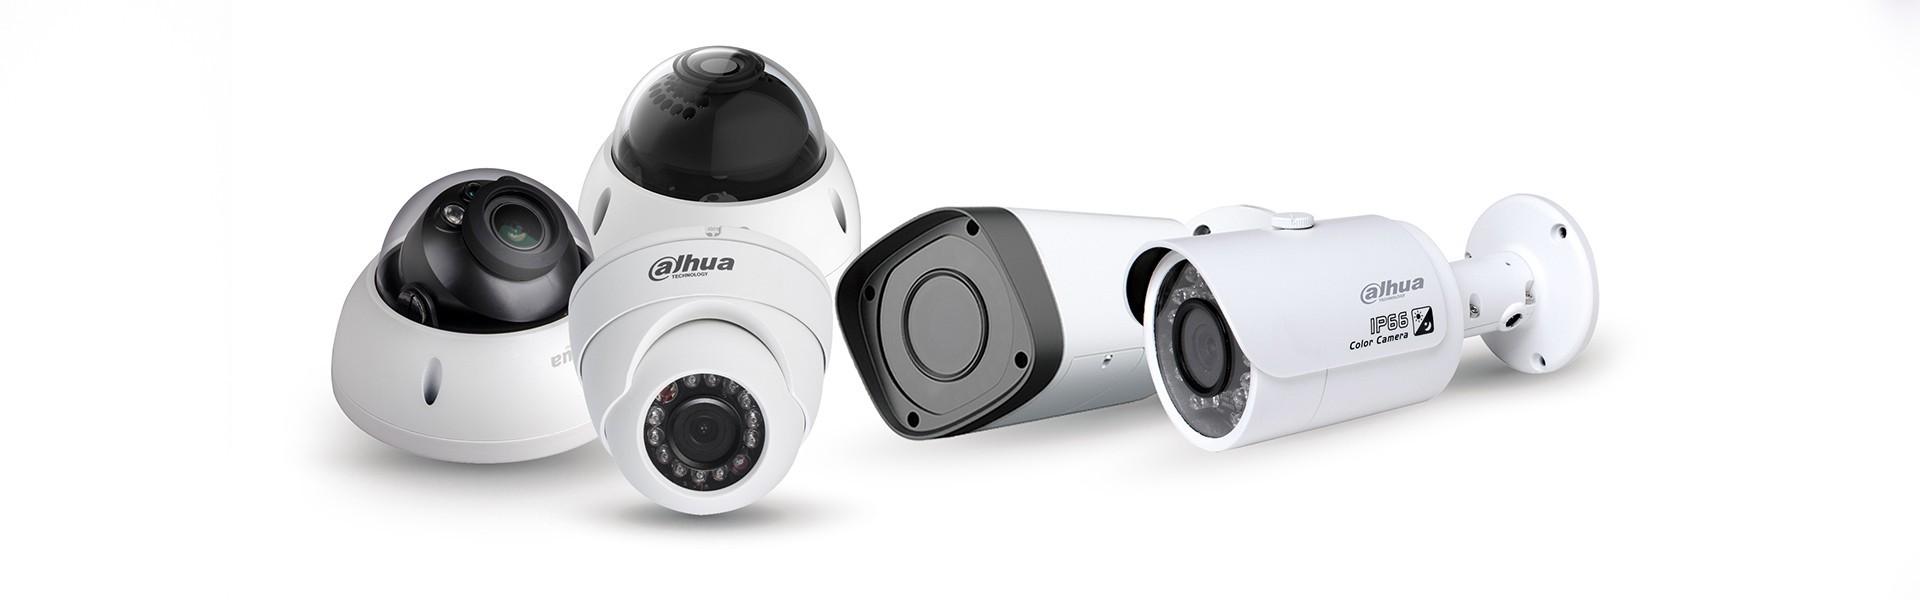 Dahua HD-CVI Камери